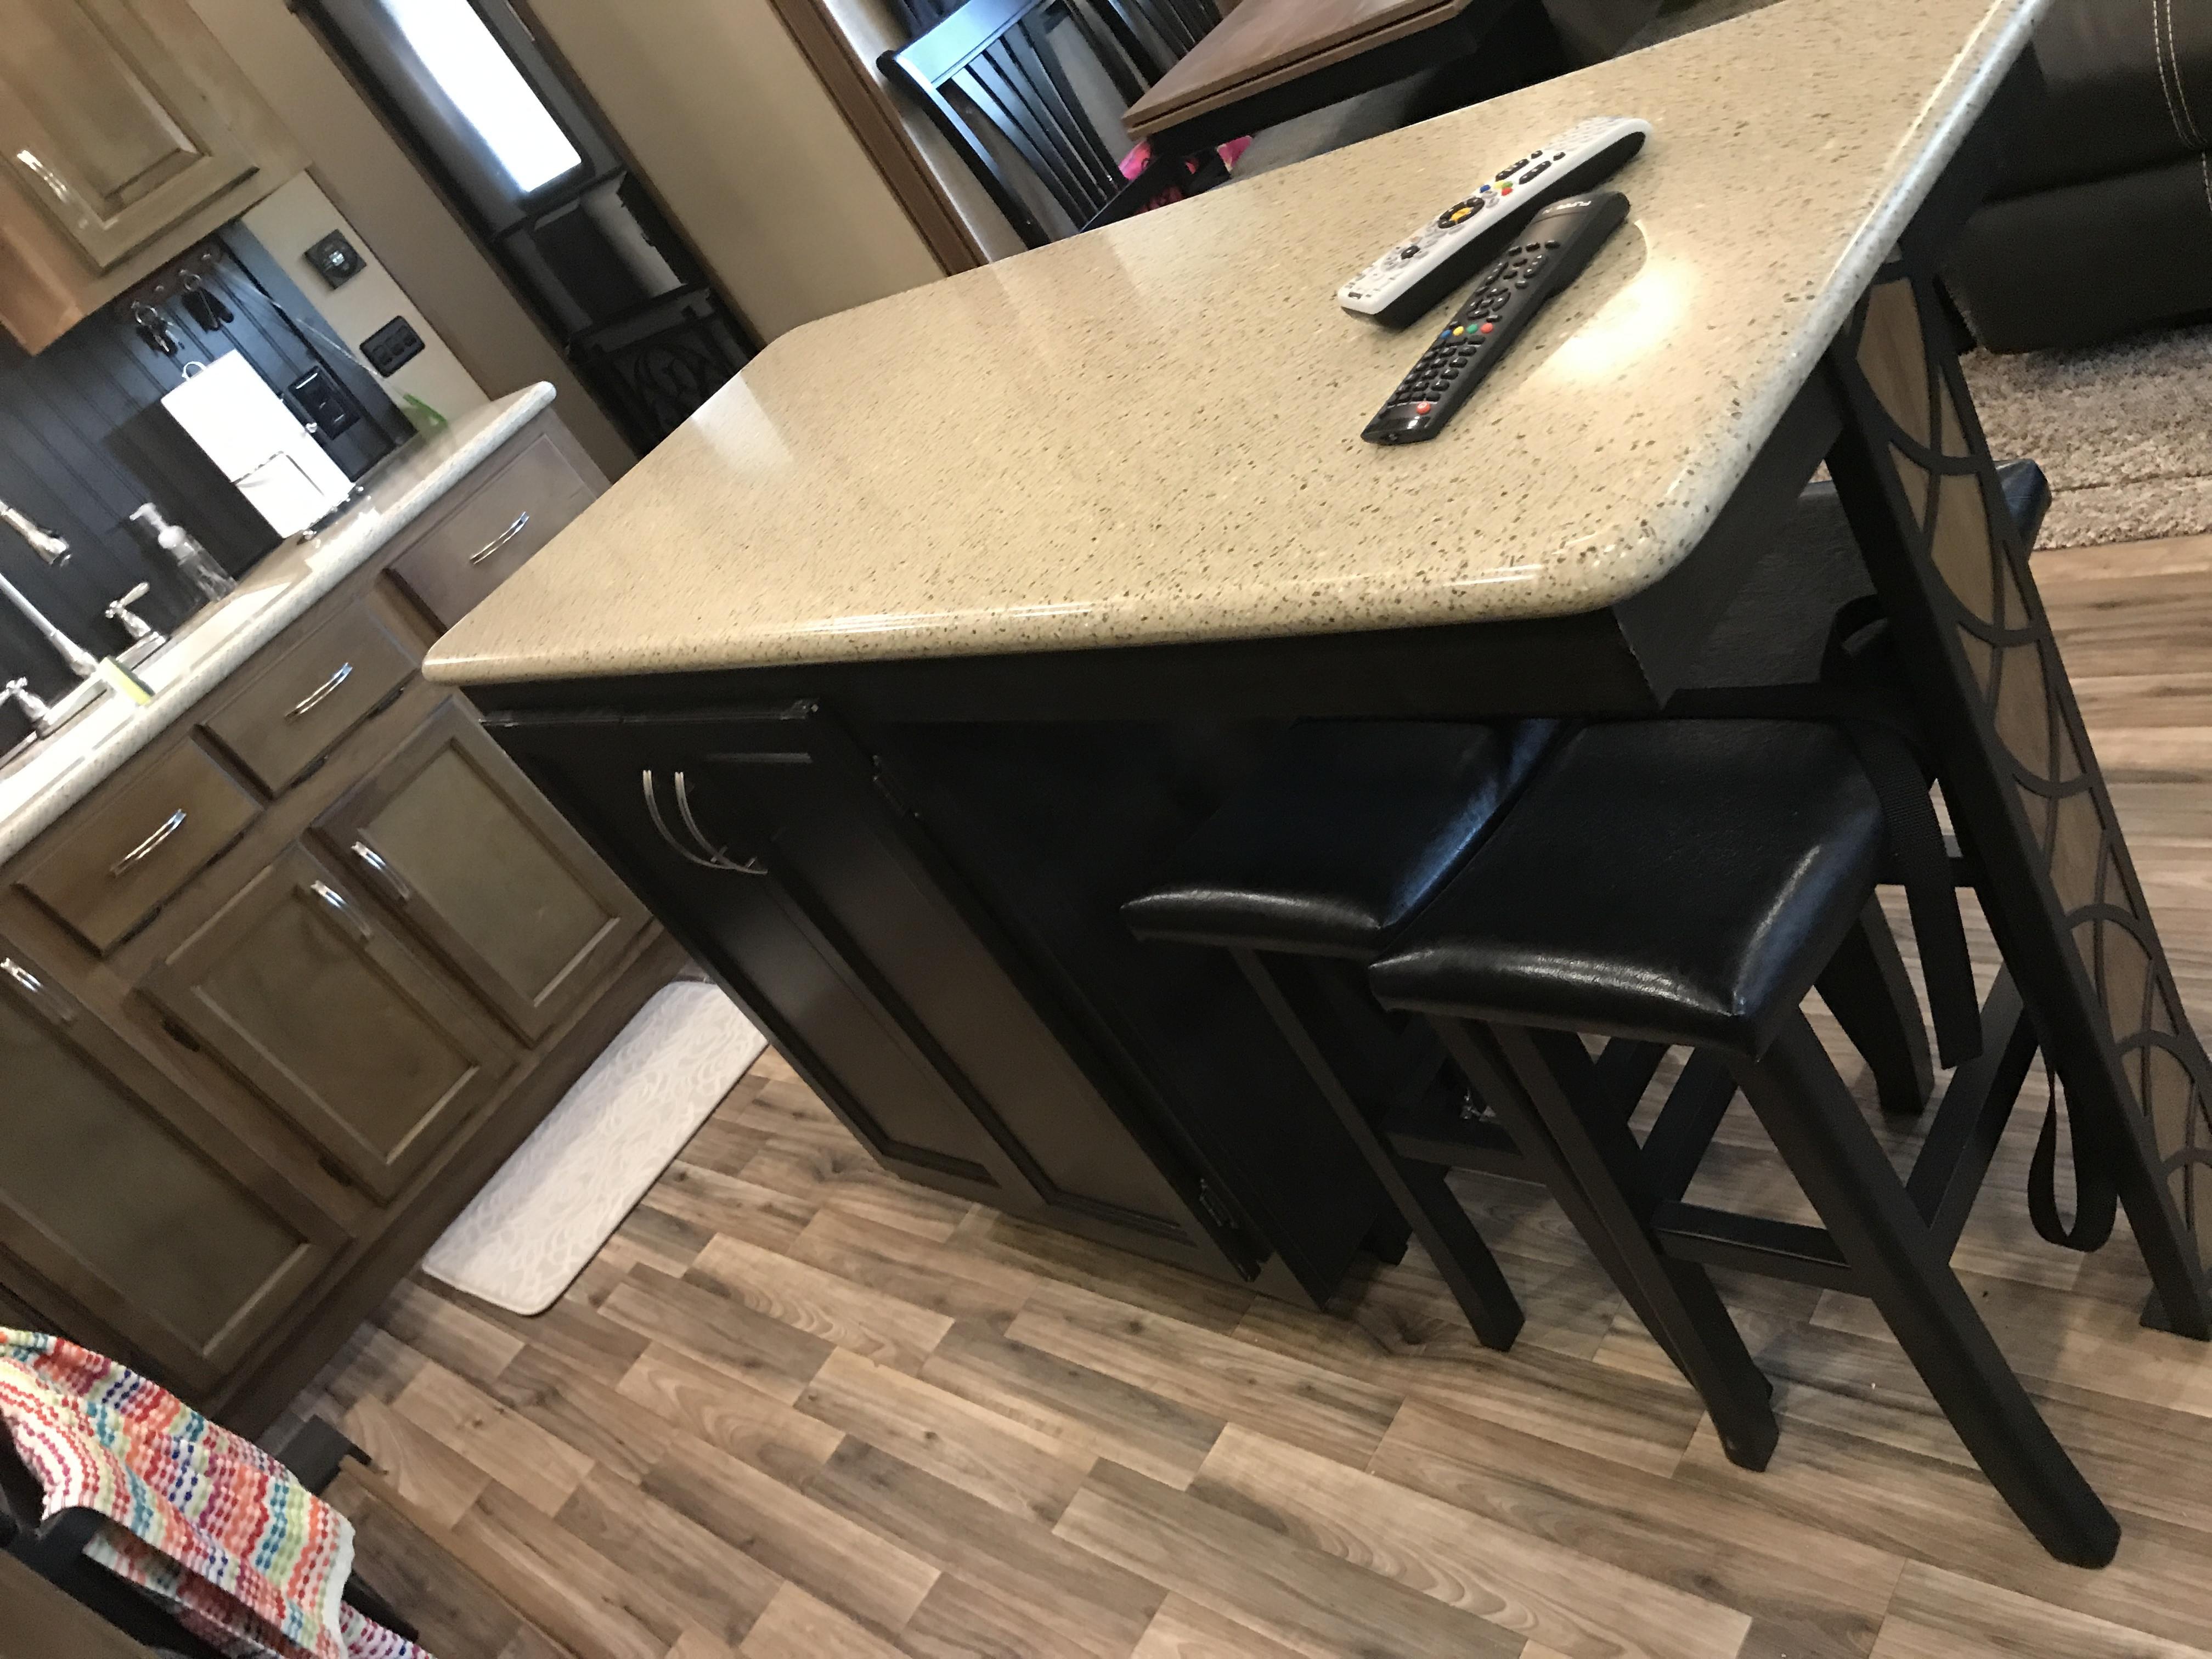 17 Elegant Hardwood Floor Repair Charleston Sc 2021 free download hardwood floor repair charleston sc of top 25 sherman tx rv rentals and motorhome rentals outdoorsy within gjb1axt7wws8jp44iuv3